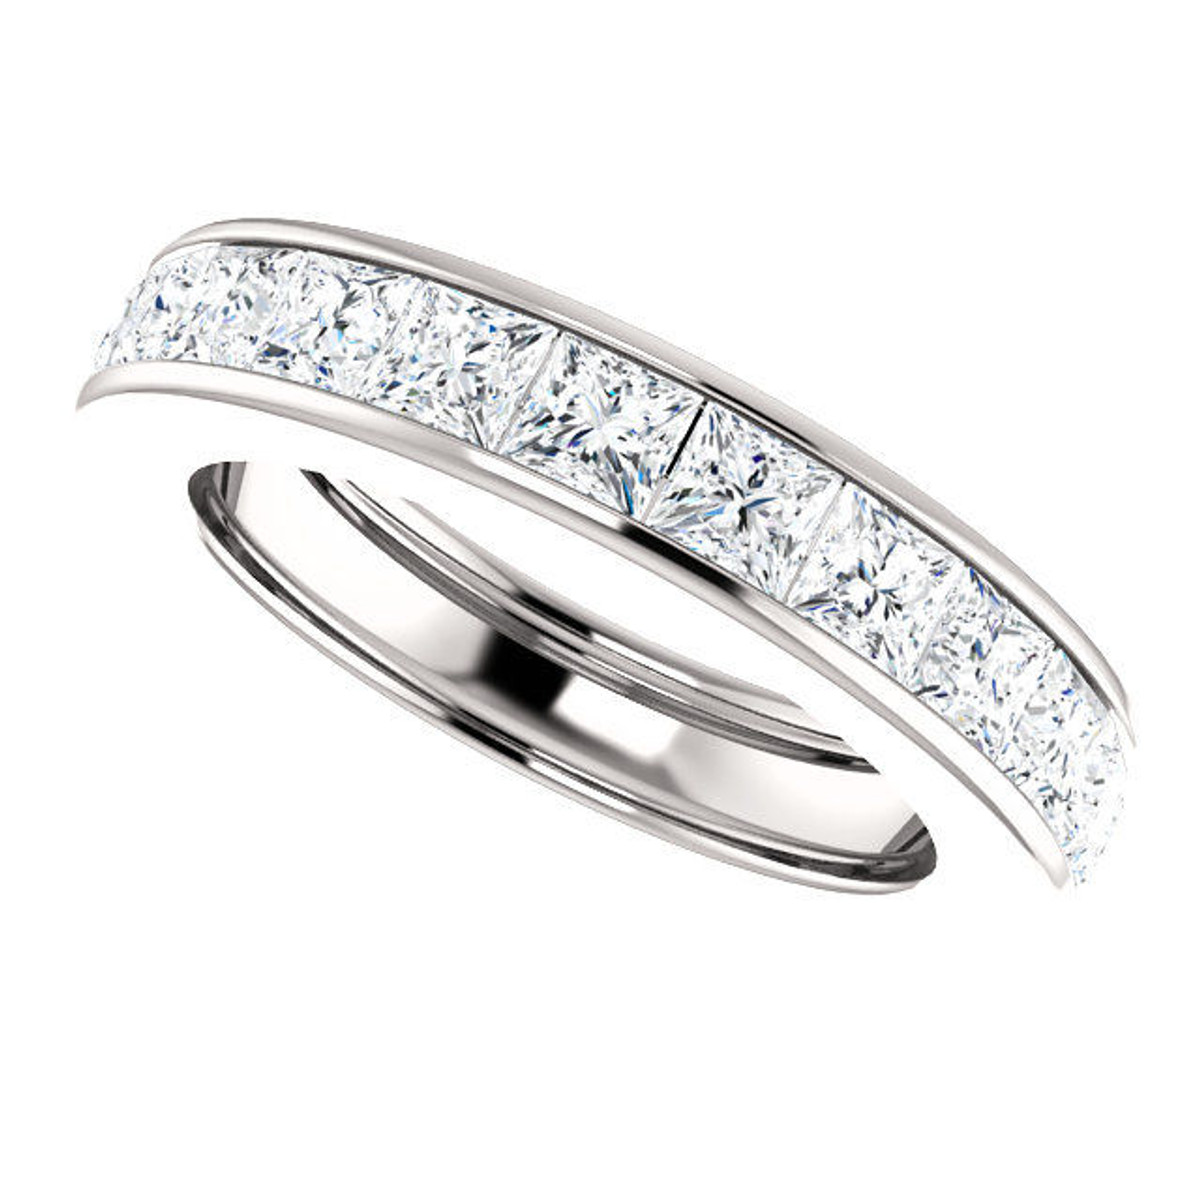 Platinum 3.9 ct tw Princess Cut Diamond Eternity Ring